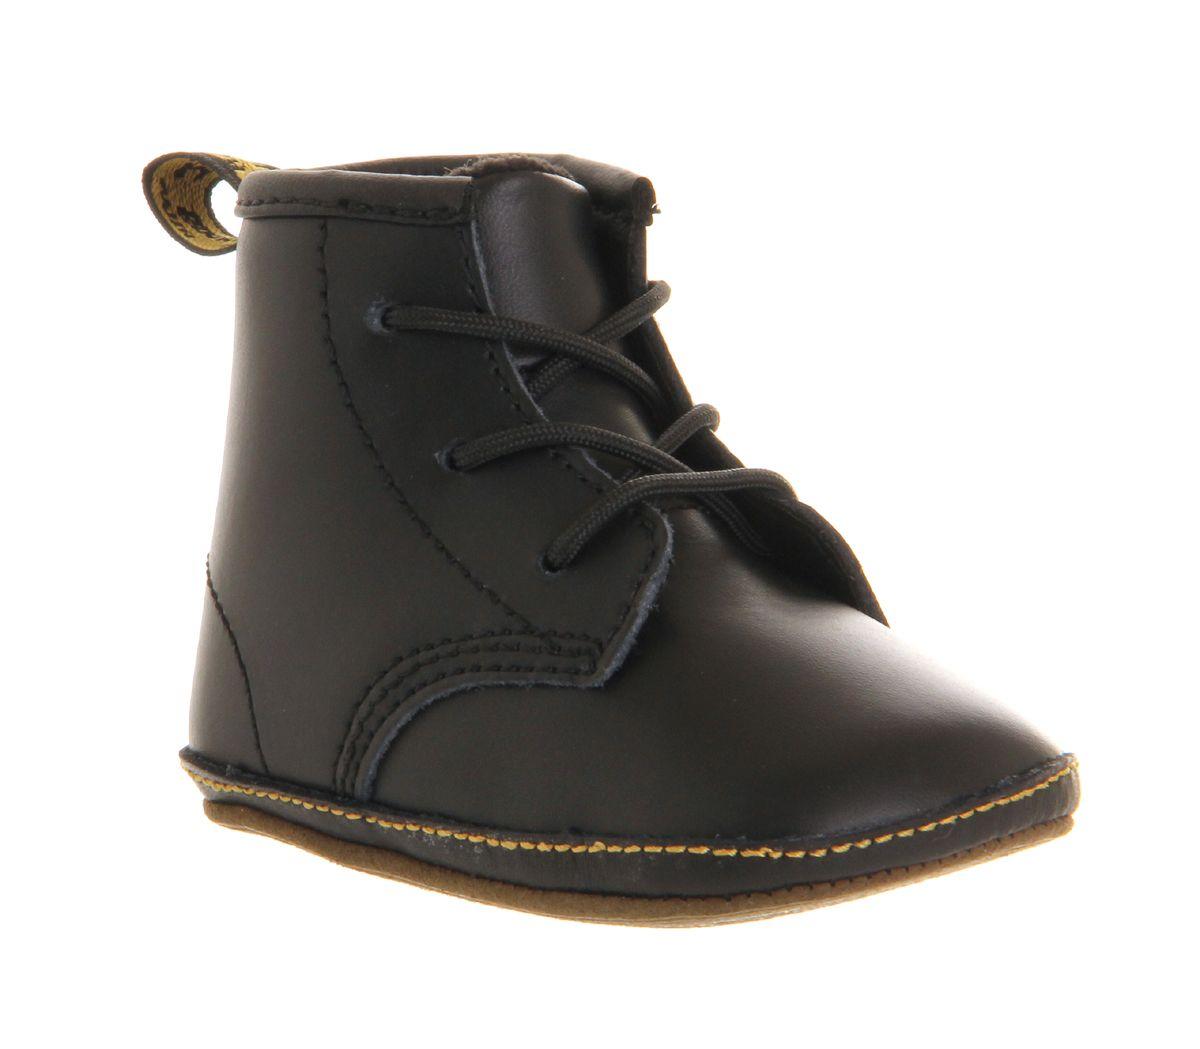 dec40b413ccc Dr. Martens Crib Bootie Auburn Black Leather - Unisex   Baby wish ...